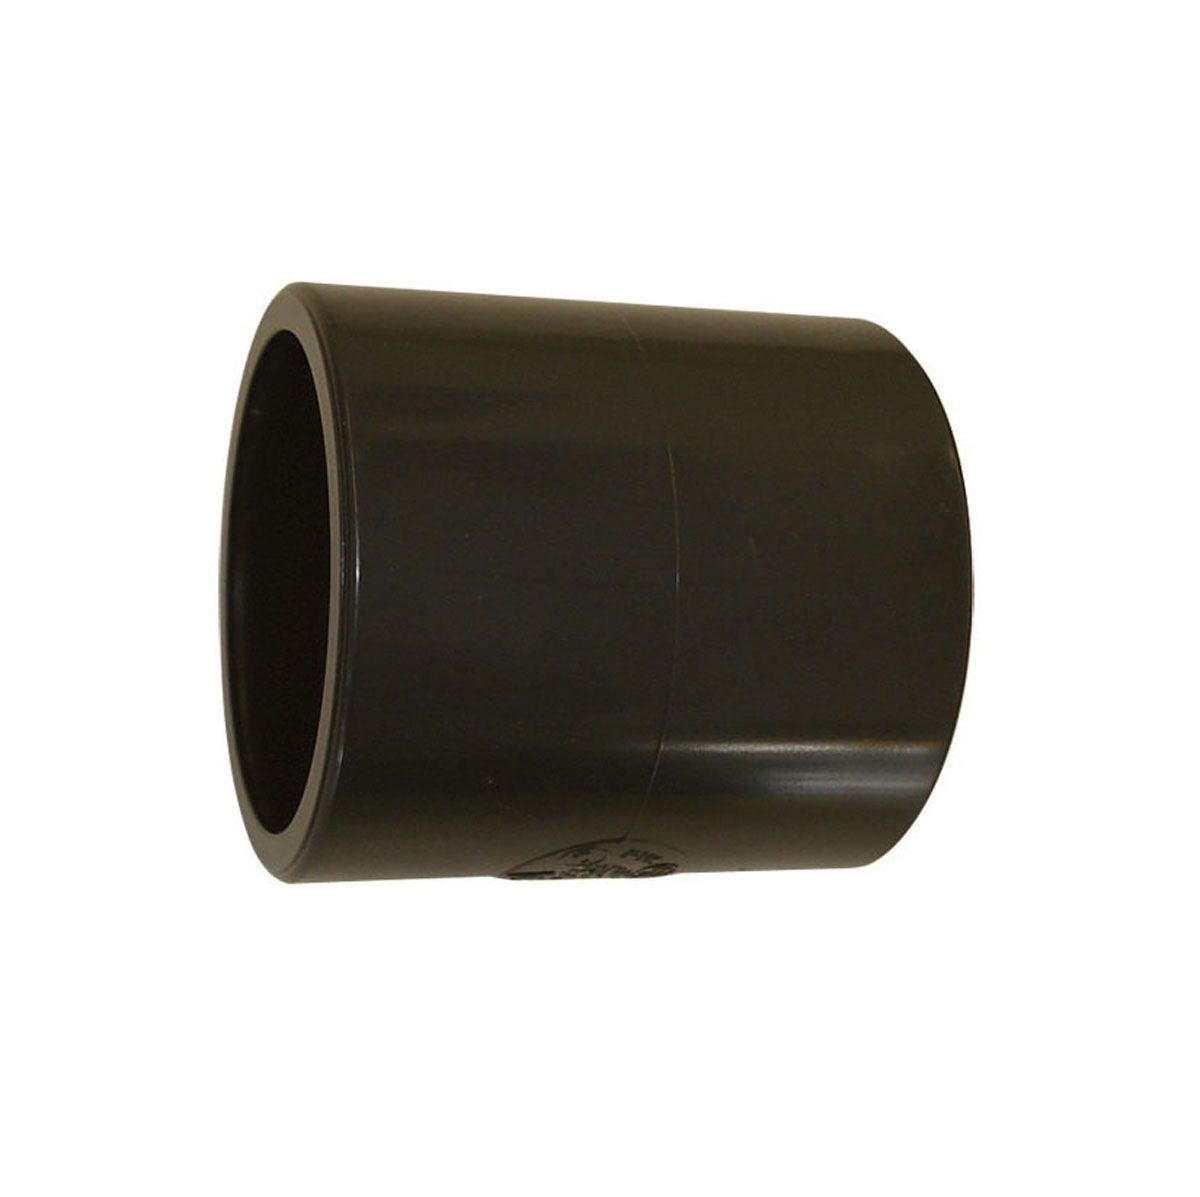 Doppelmuffe zum Kleben, aus PVC, grau, d 16 mm, PN 16